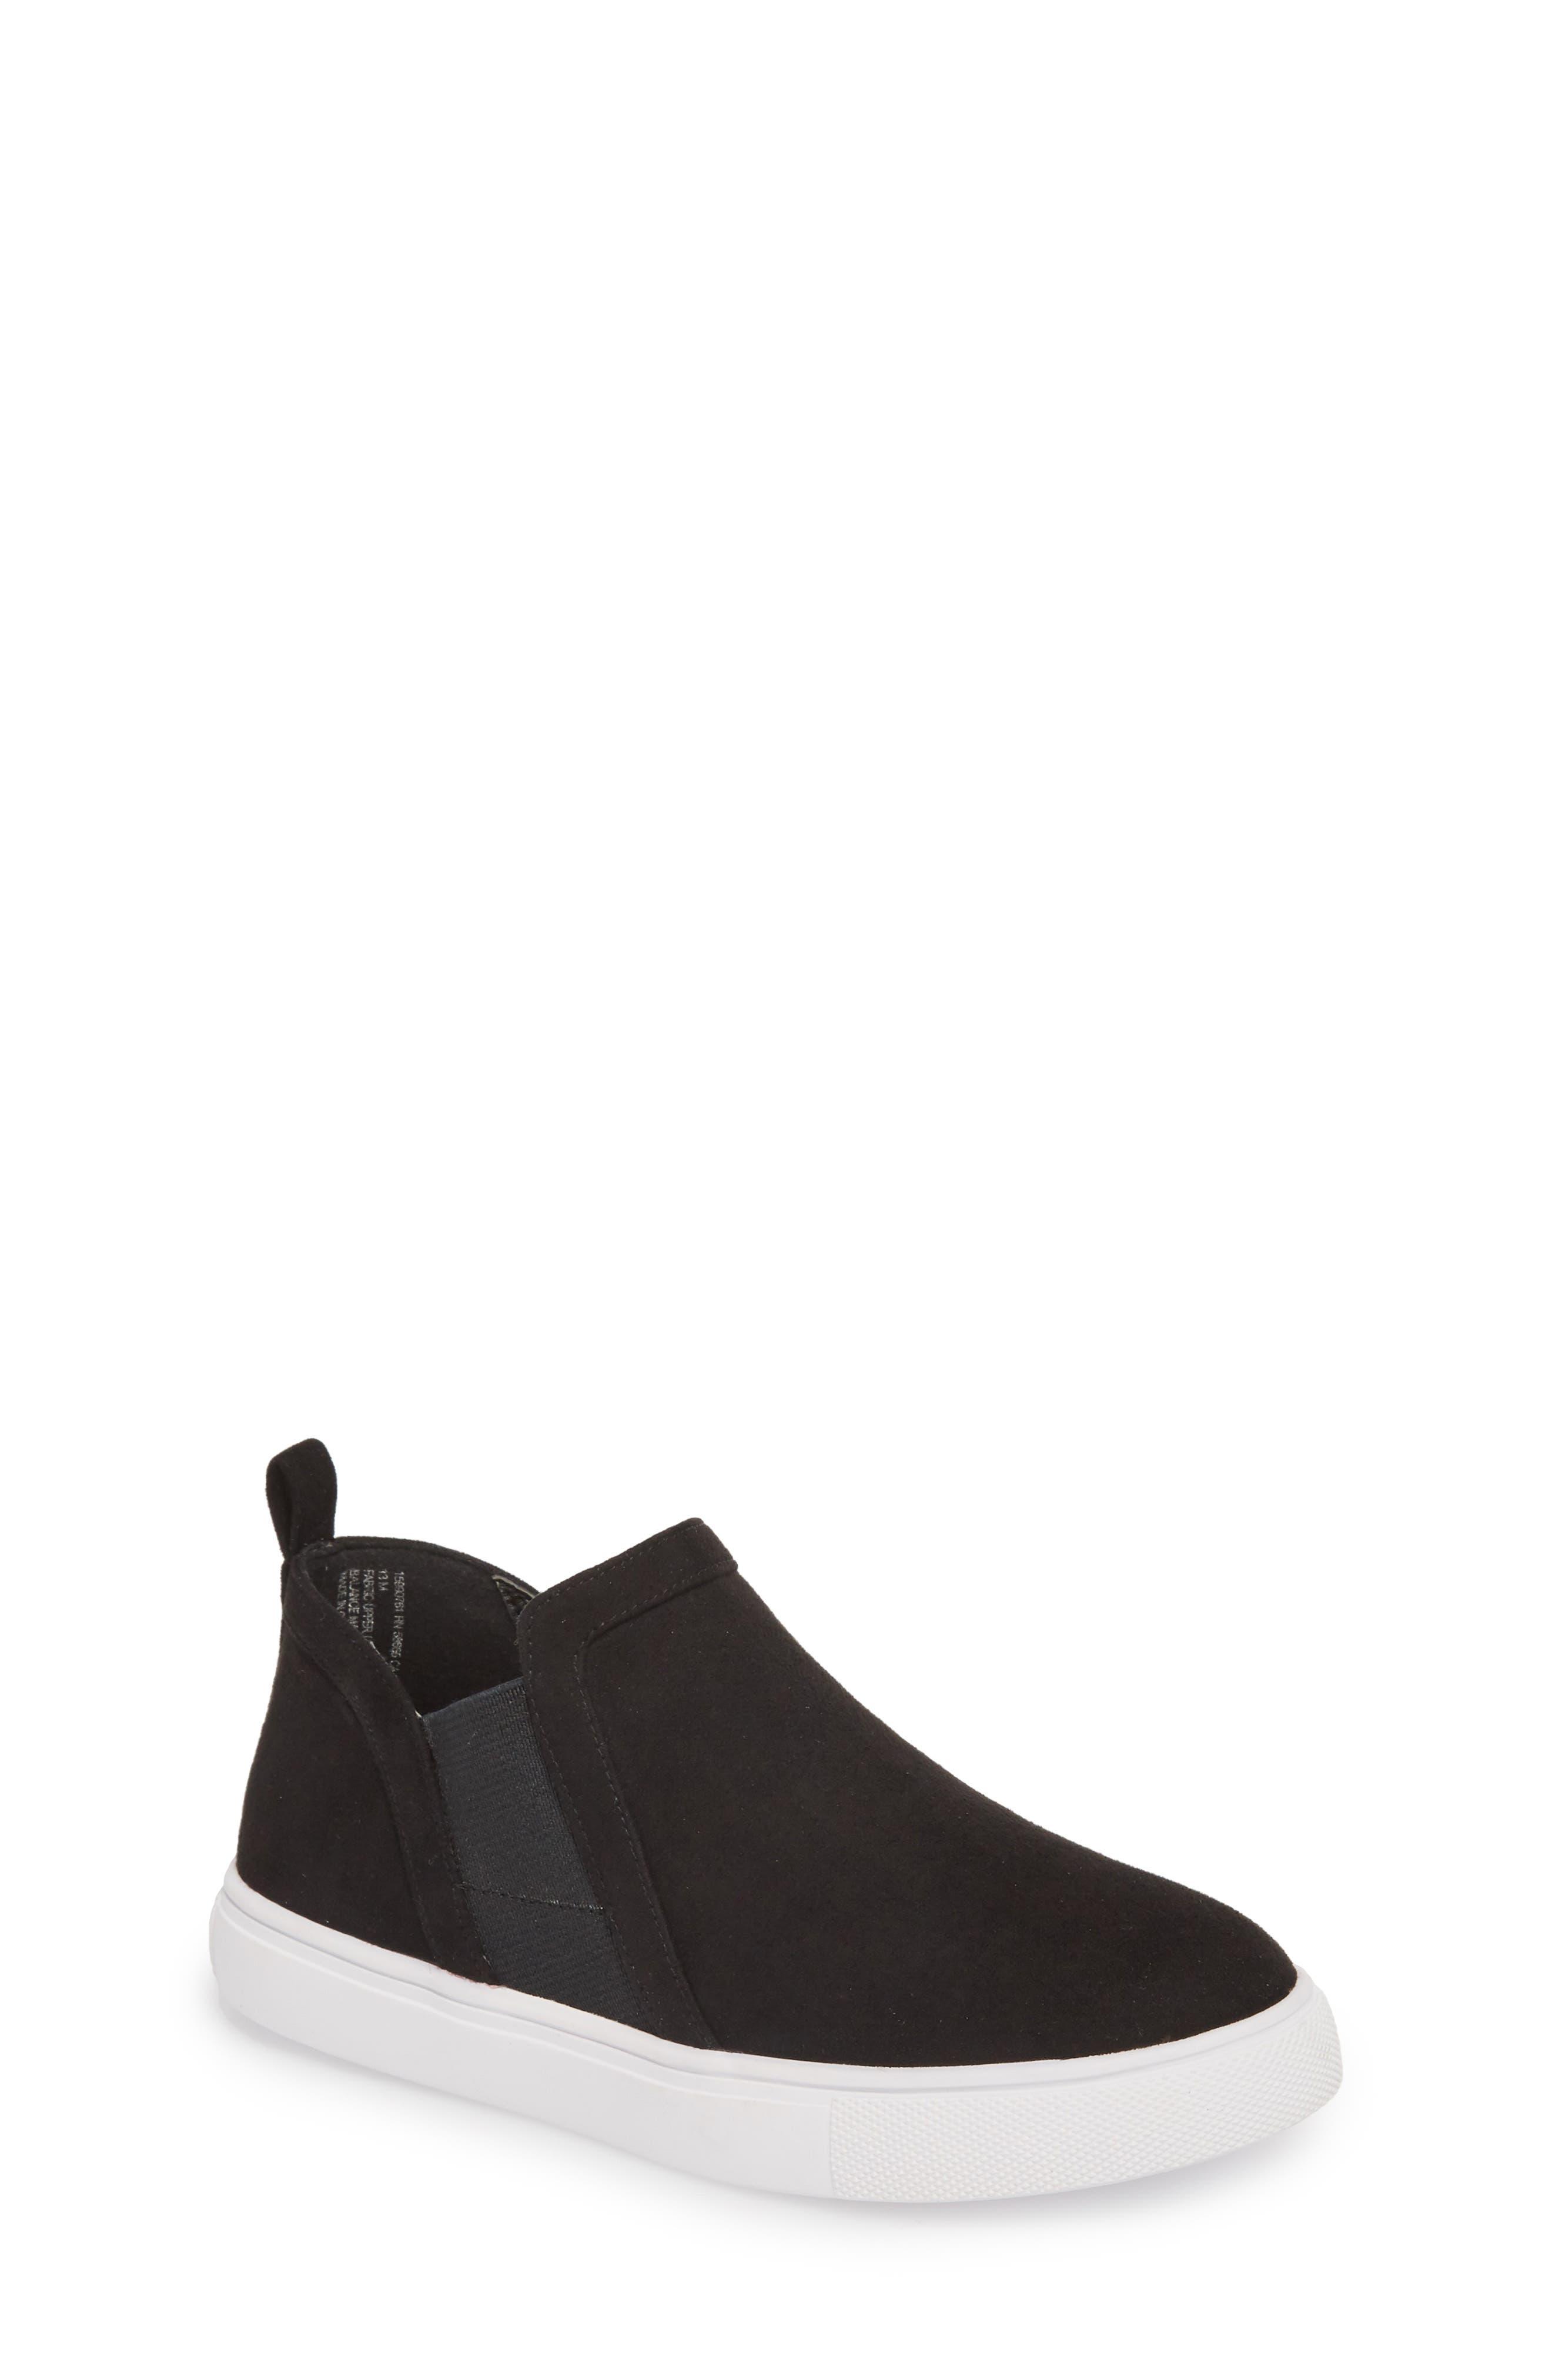 Scarlett Sneaker,                             Main thumbnail 1, color,                             BLACK FAUX SUEDE